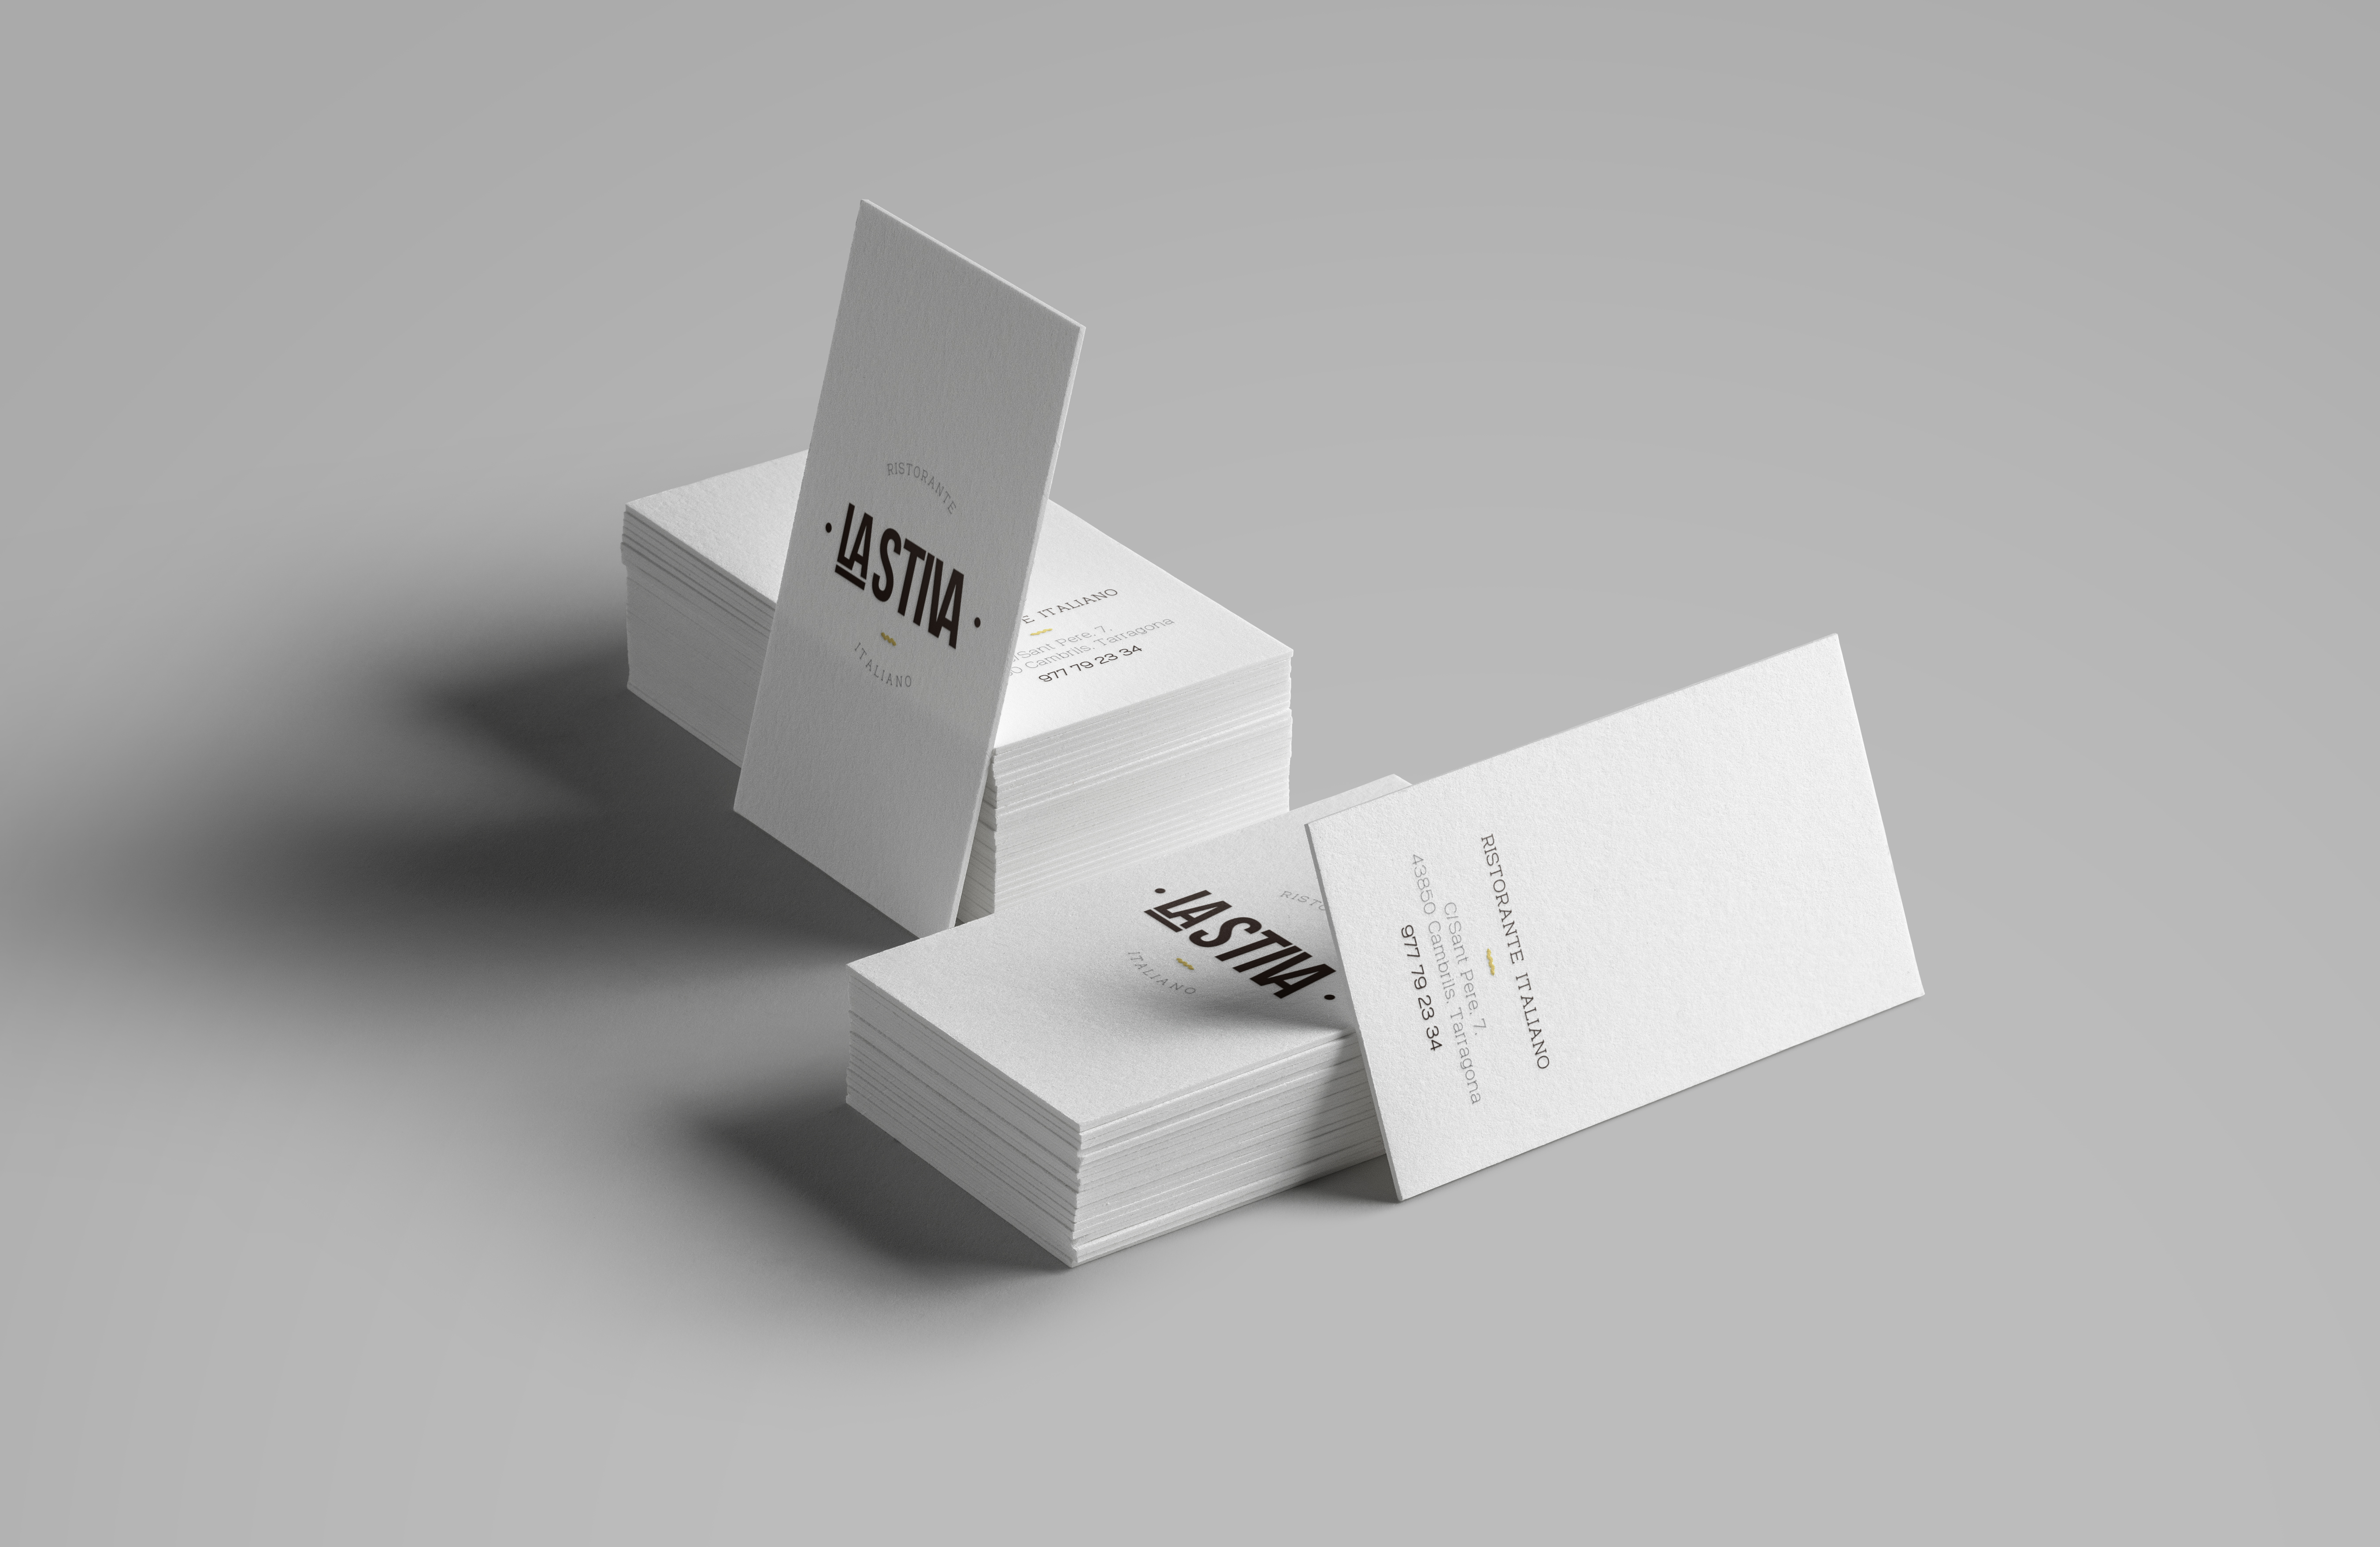 LaStiva disseny gràfic Pàkaru estudi creatiu Tarragona